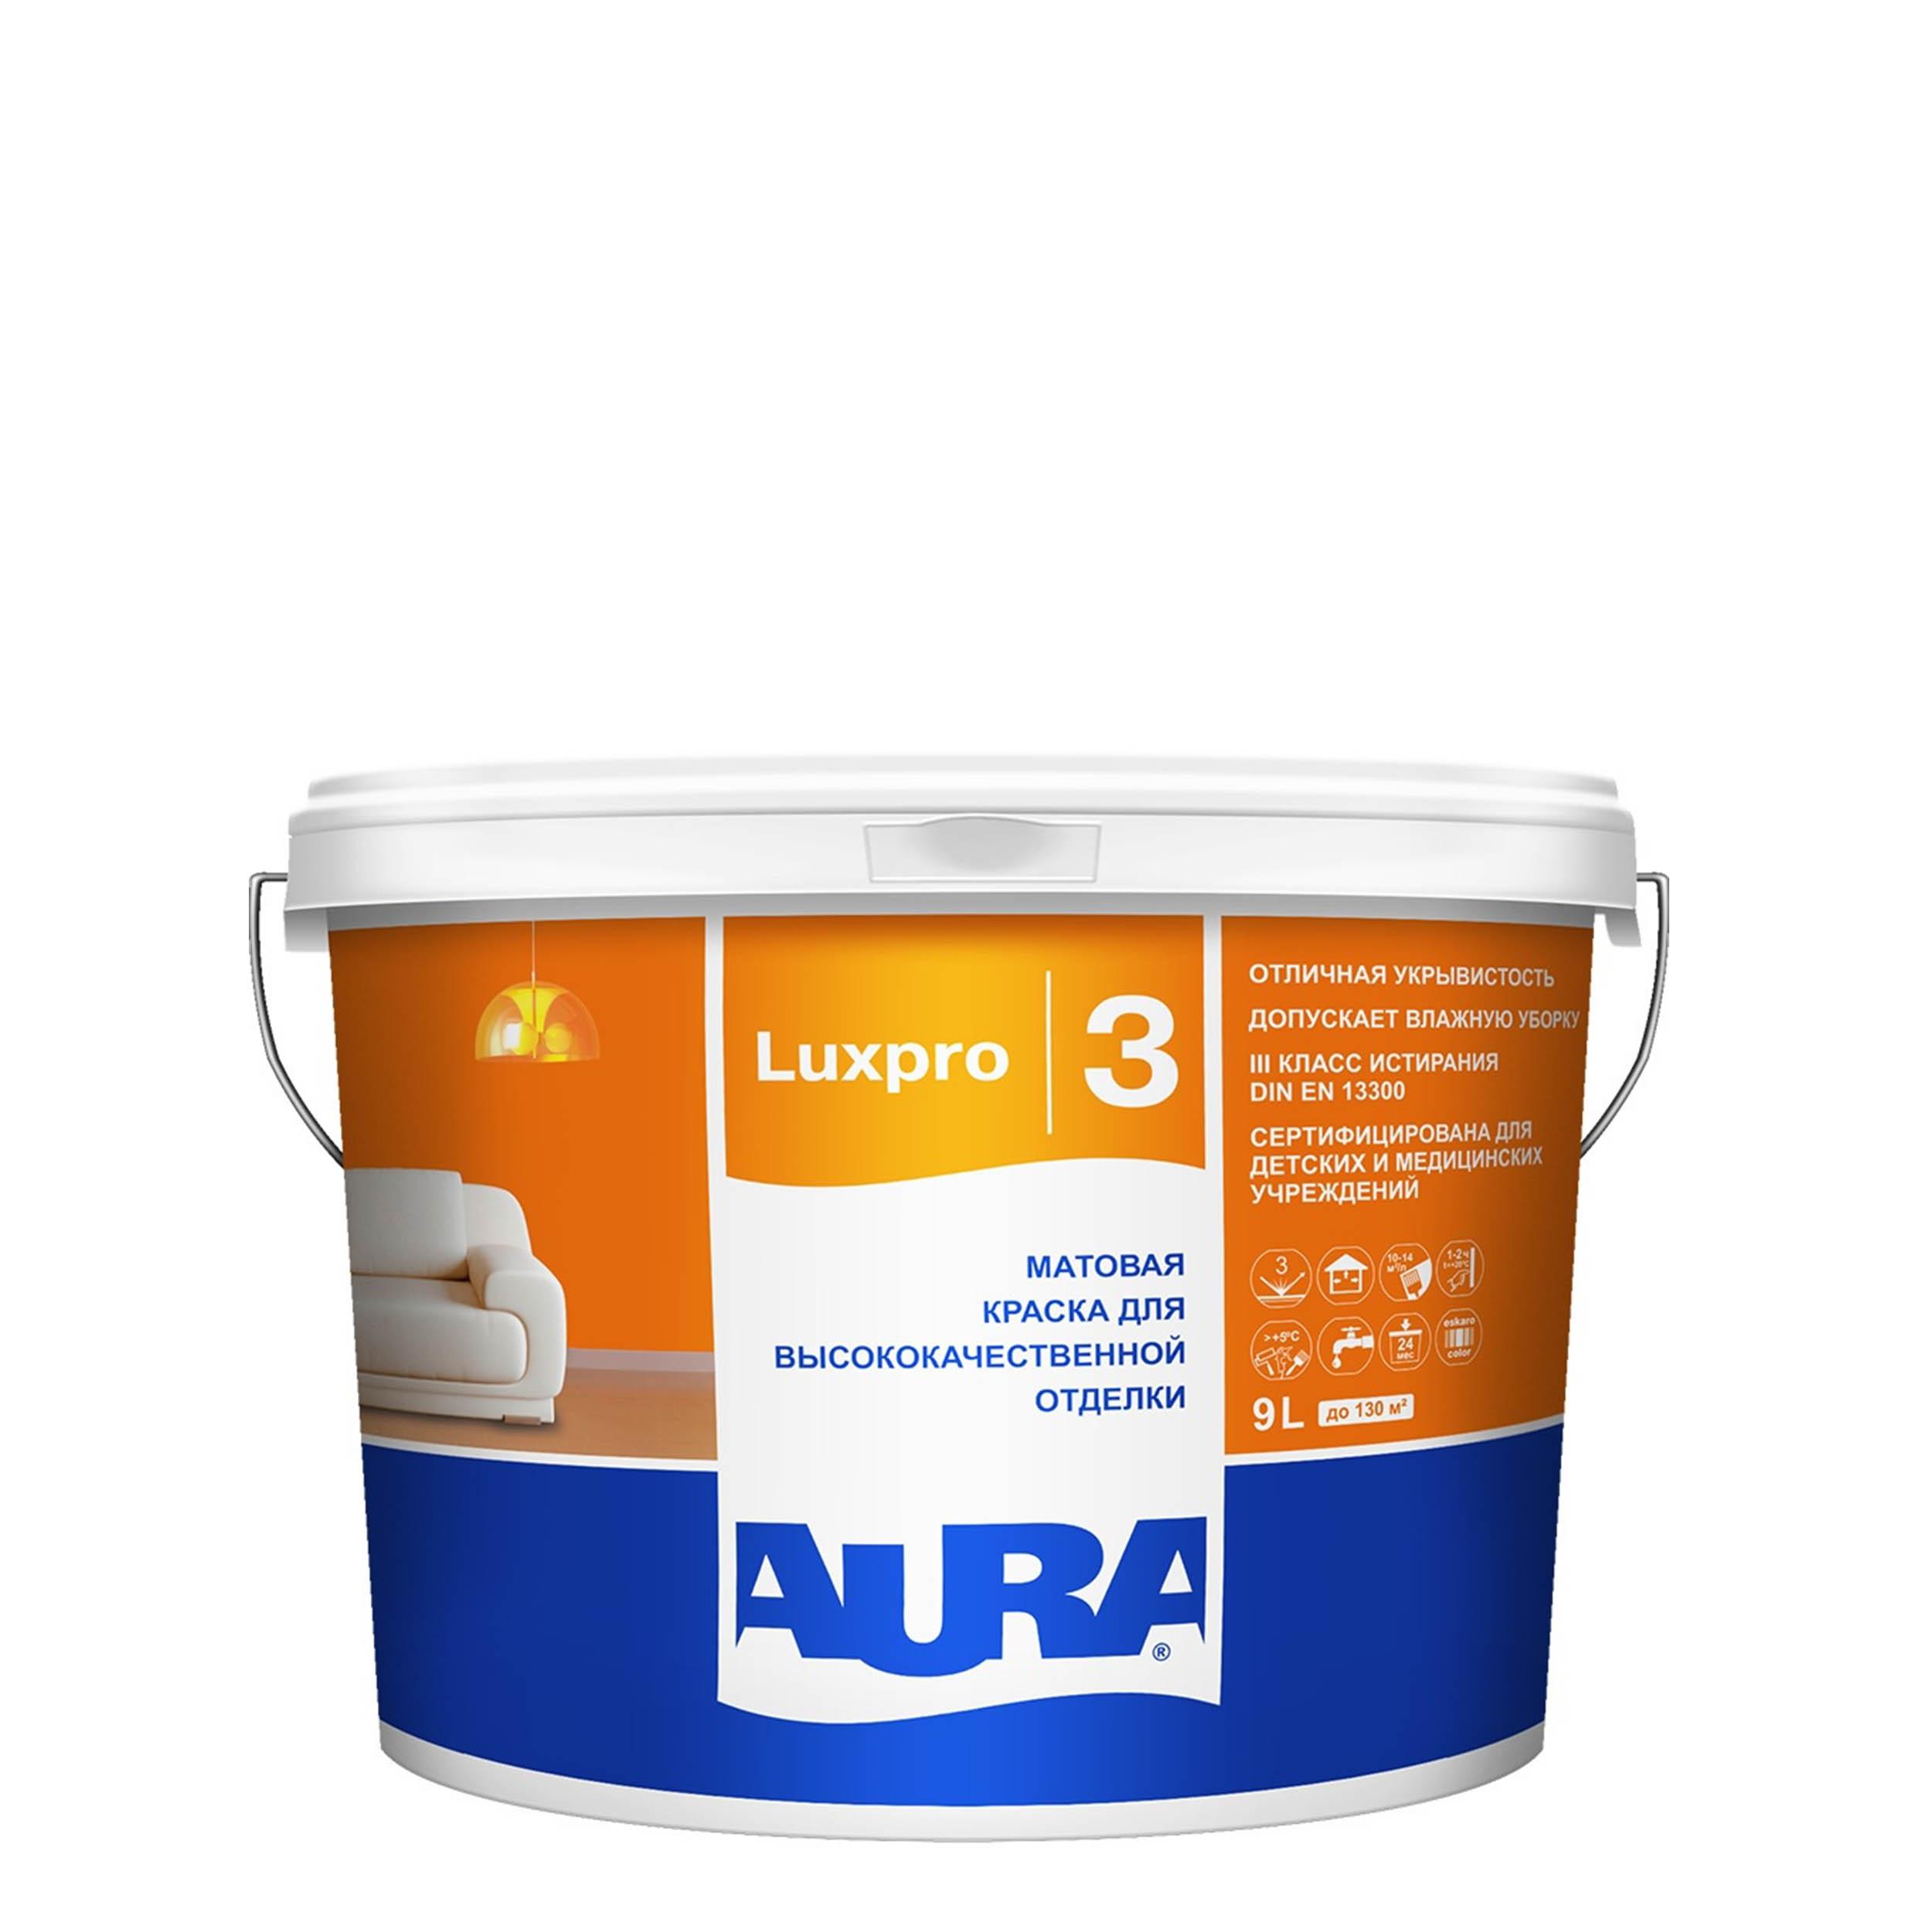 Фото 3 - Краска интерьерная, Aura LuxPRO 3, RAL 3001, 11 кг.